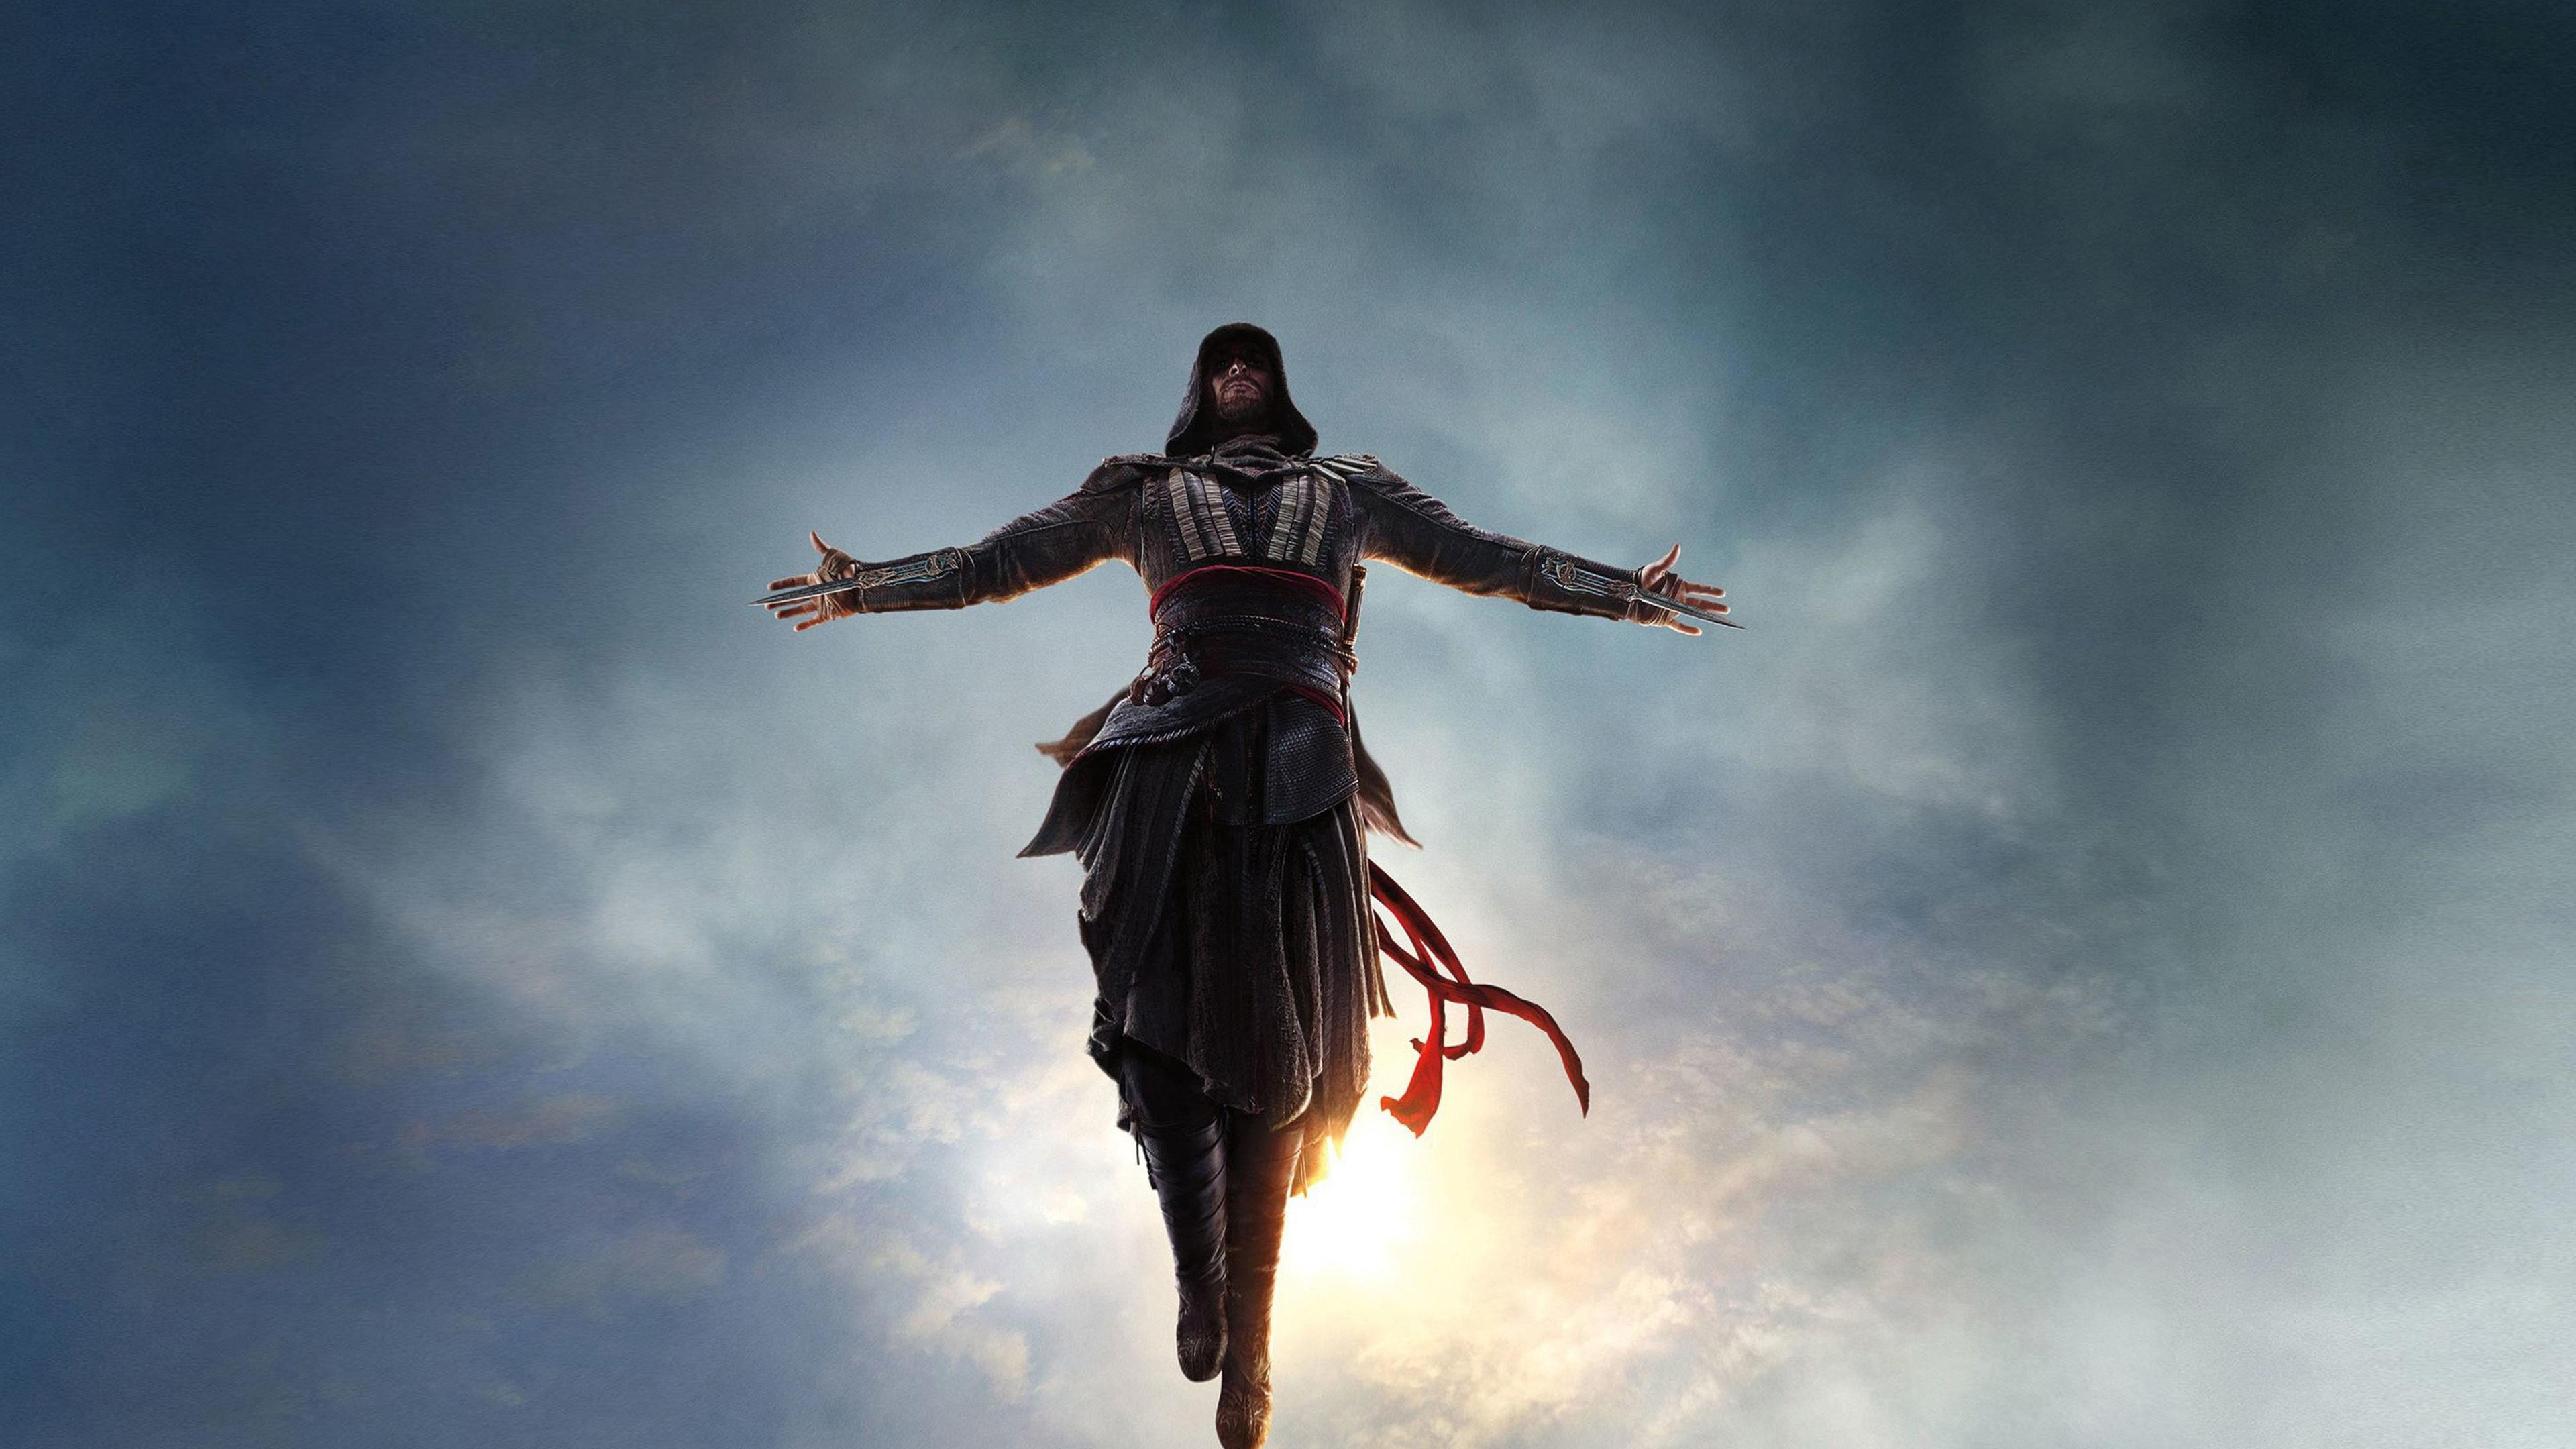 movie assassins creed 1536363717 - Movie Assassins Creed - movies wallpapers, assassins creed wallpapers, assassins creed movie wallpapers, 2016 movies wallpapers